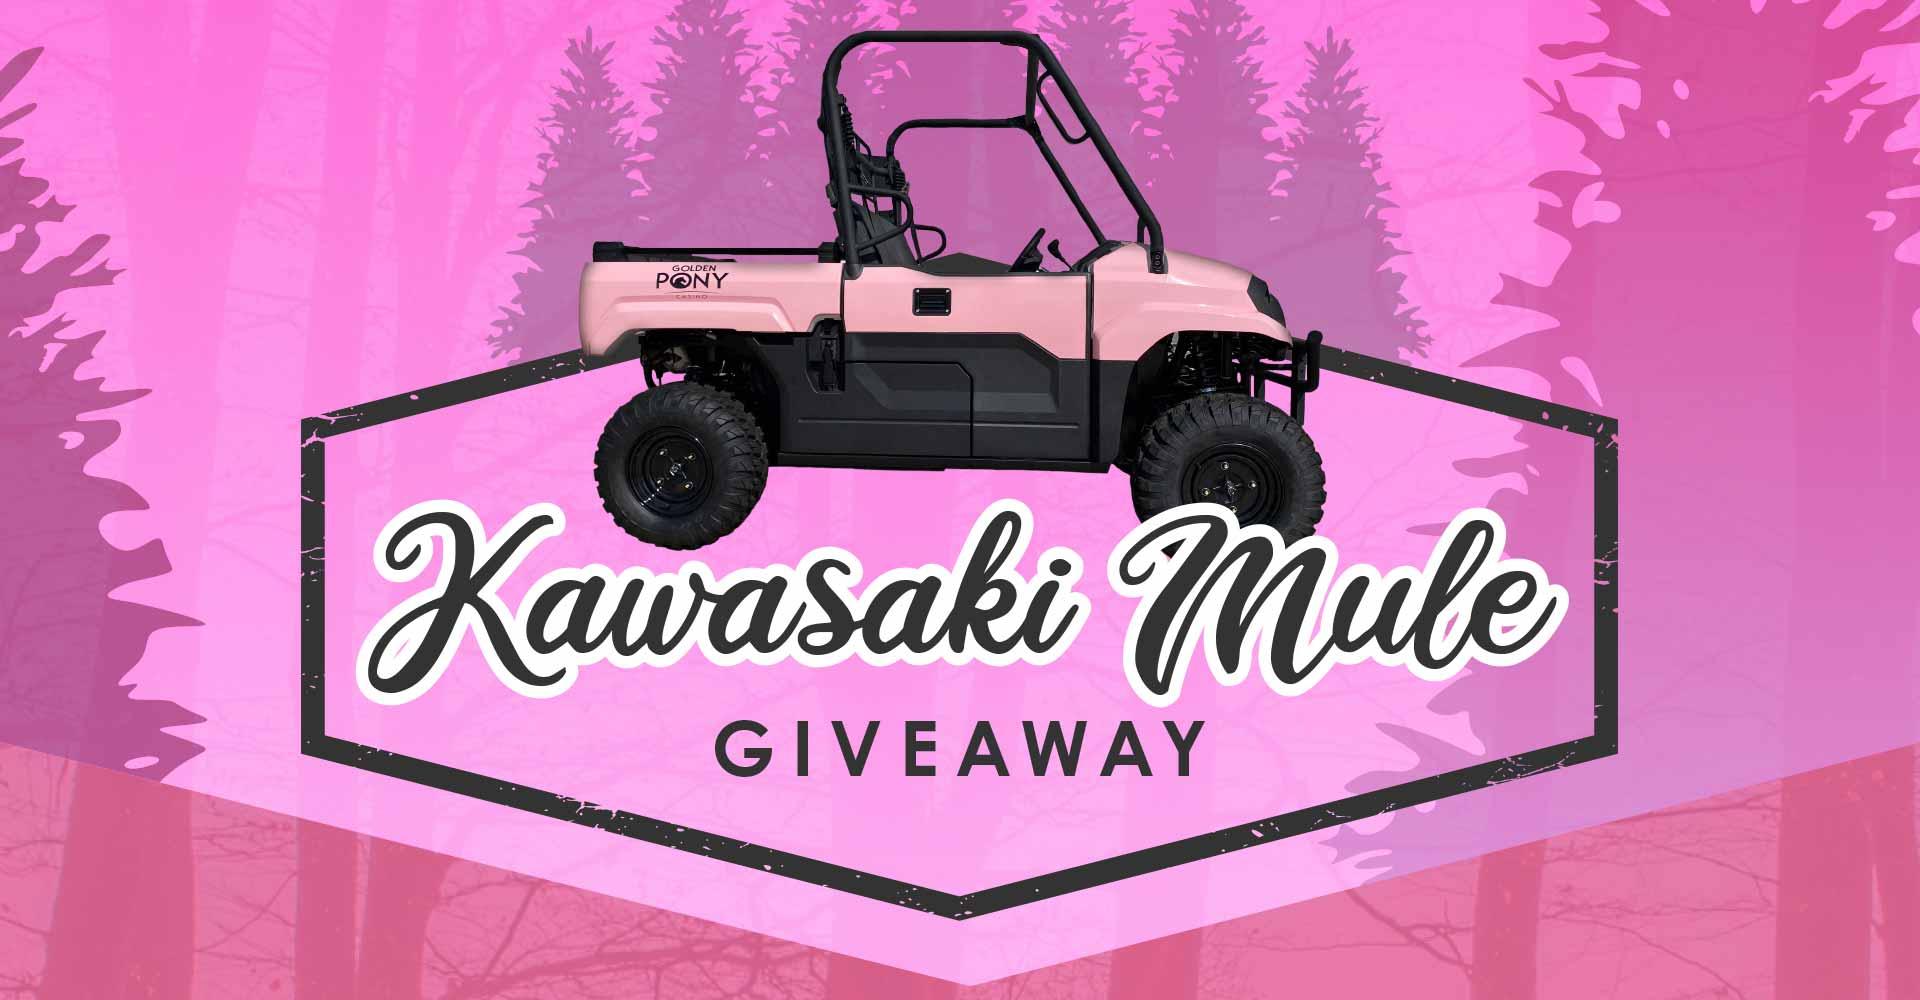 Pink Kawasaki Mule Giveaway